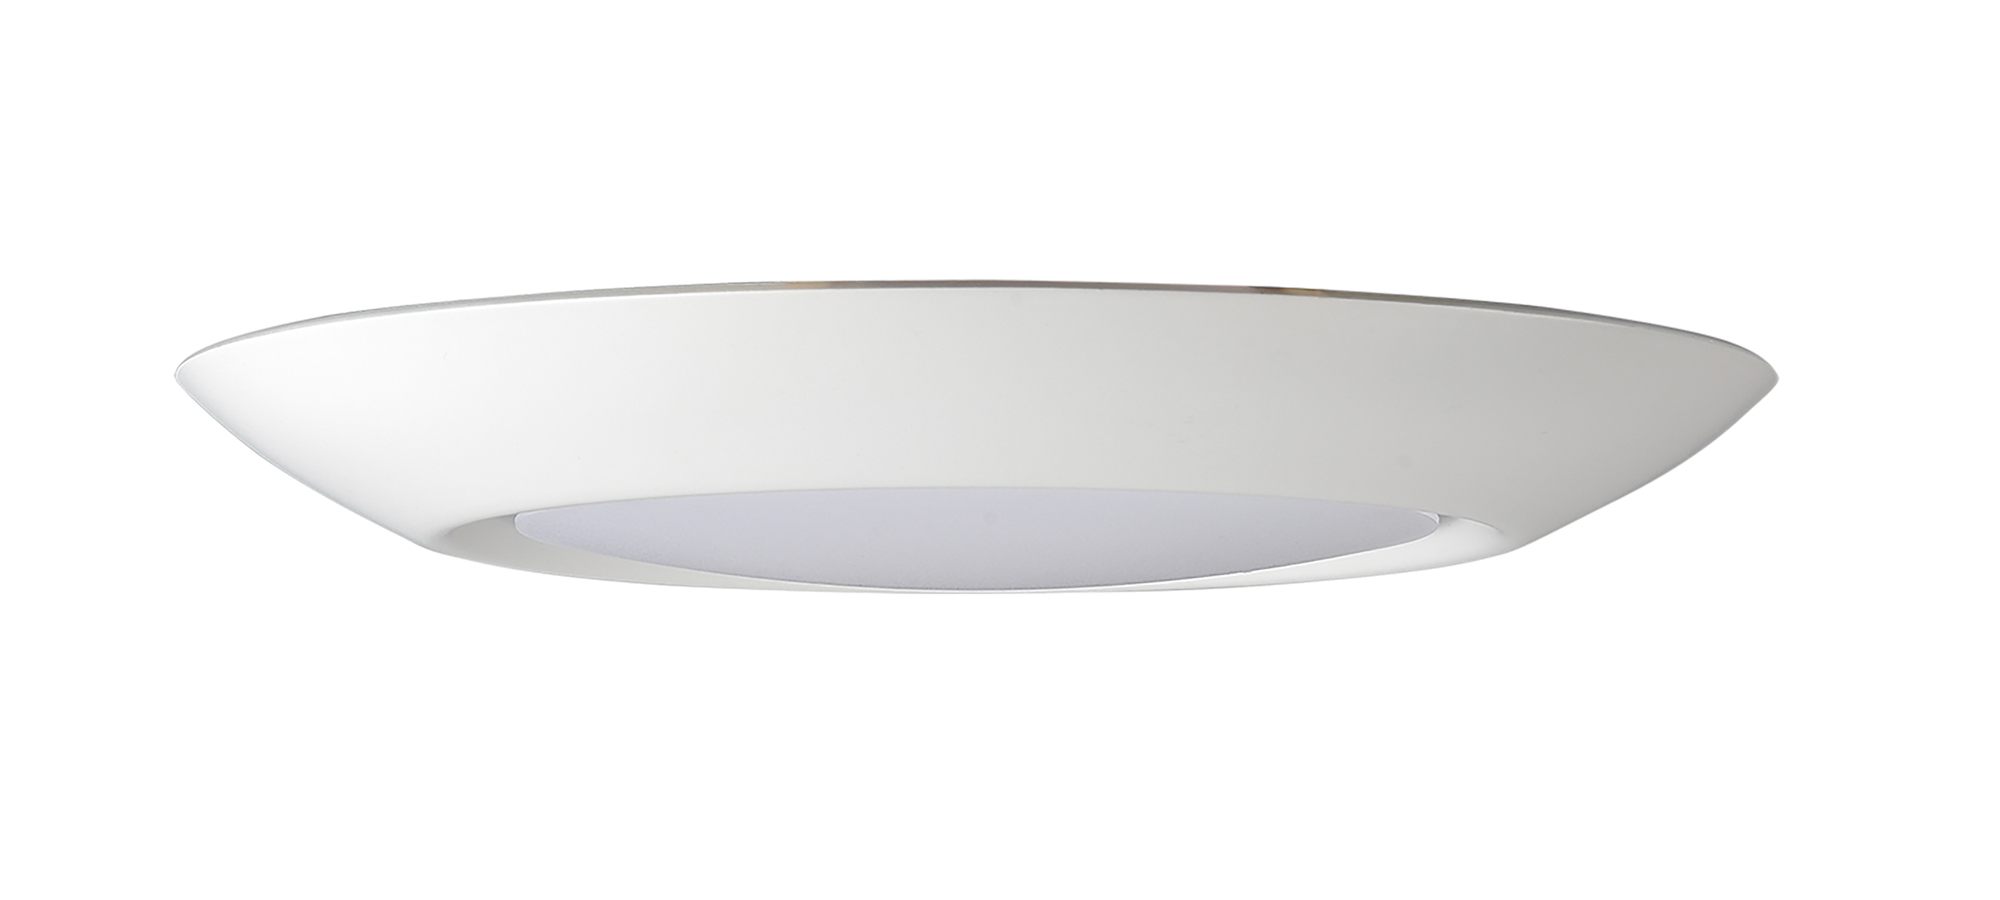 Diverse 57647 Ceiling Light Fixture By Maxim Lighting